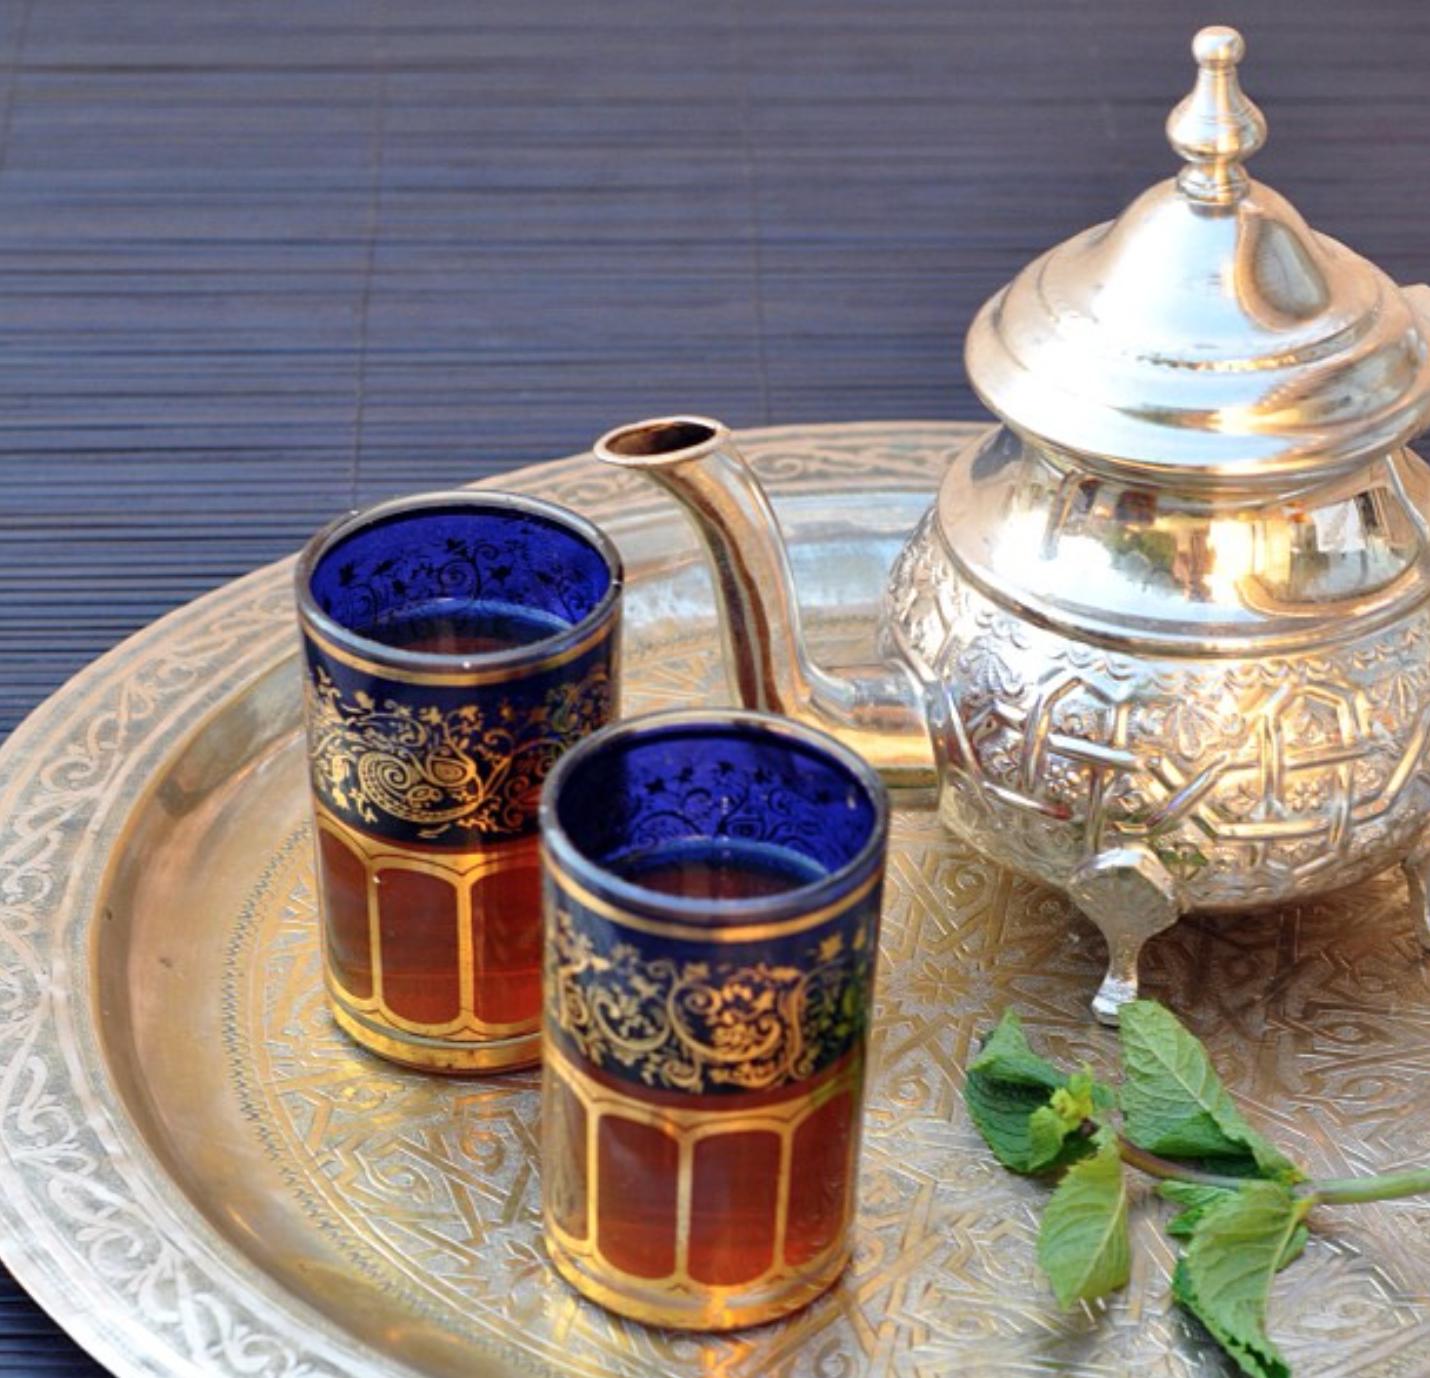 Le thé marocain | LovaLinda | Blog | Cuisine Recettes Boissons